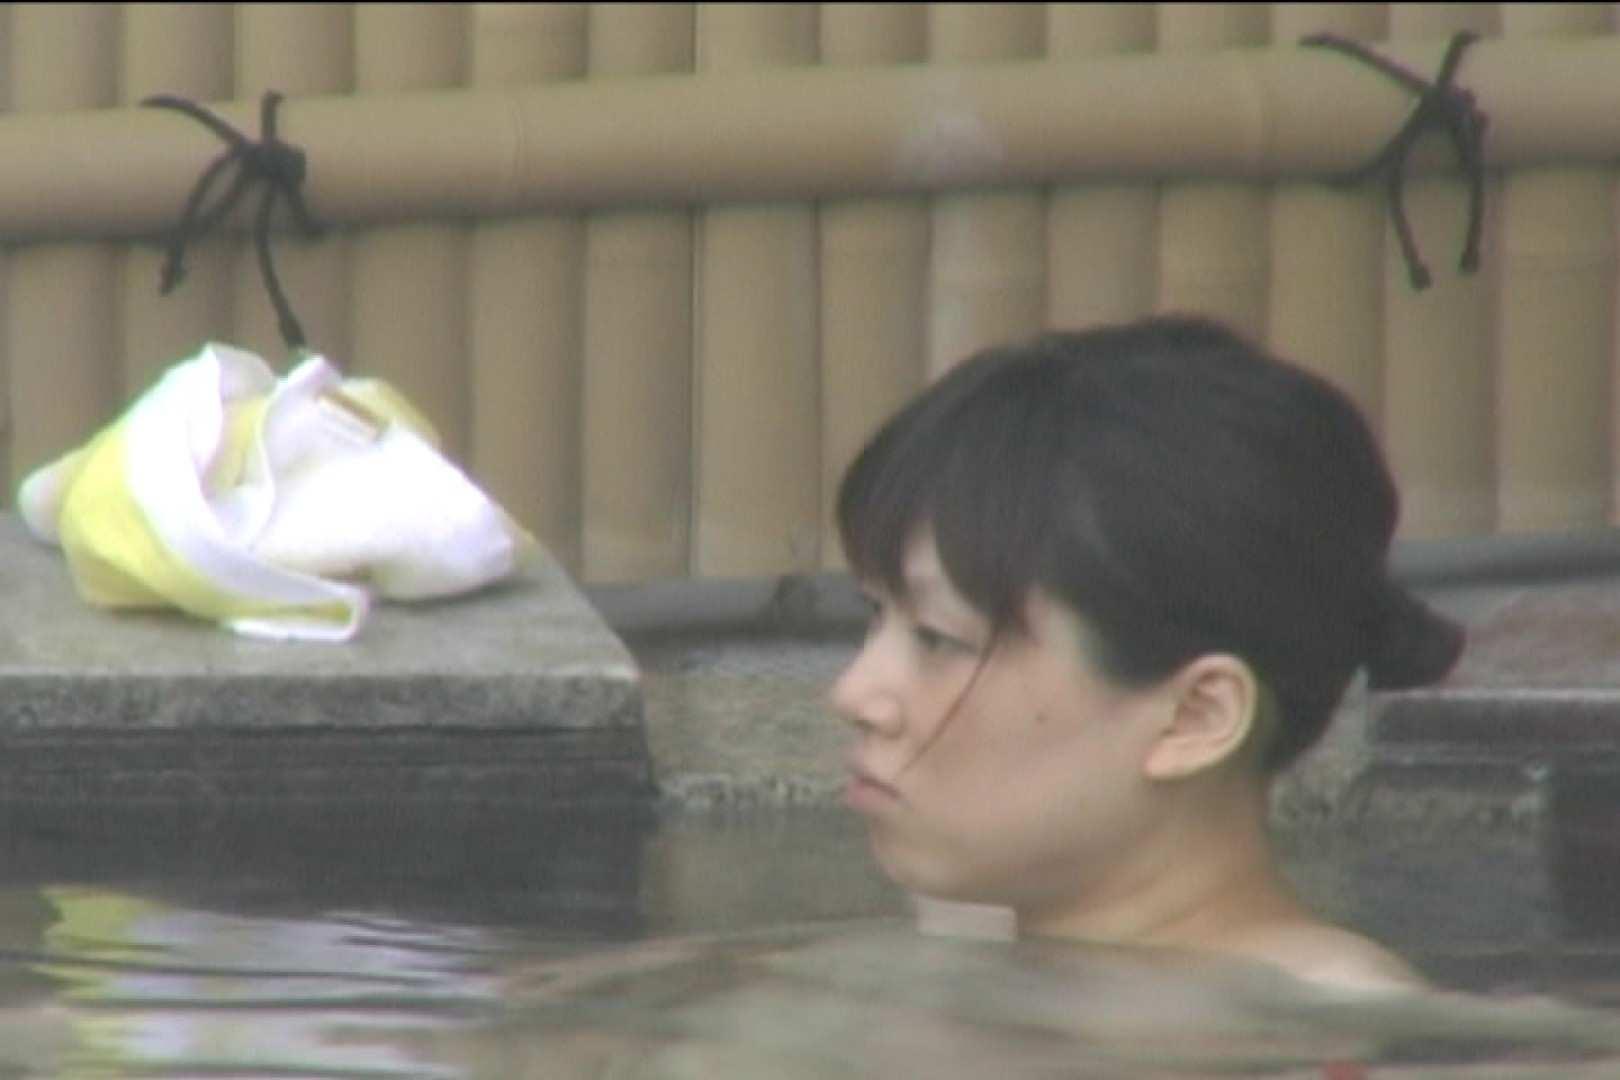 Aquaな露天風呂Vol.121 女体盗撮 隠し撮りAV無料 89連発 35